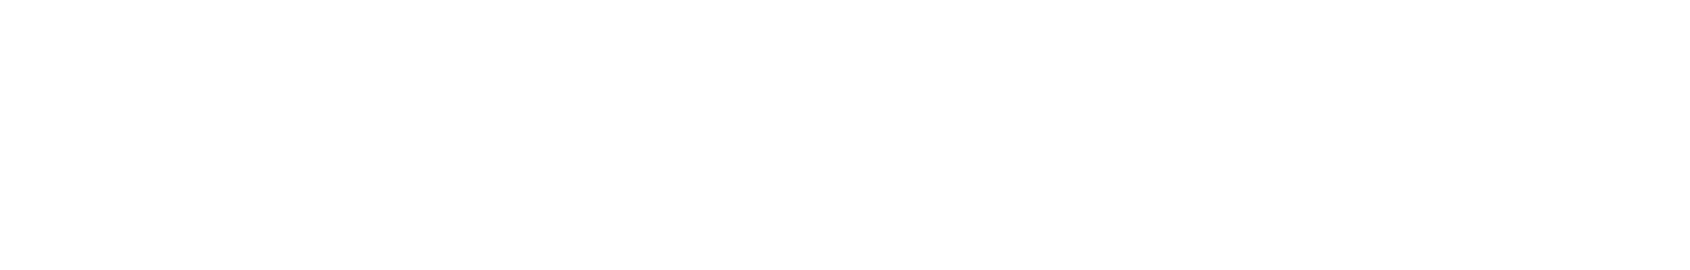 Lexacom